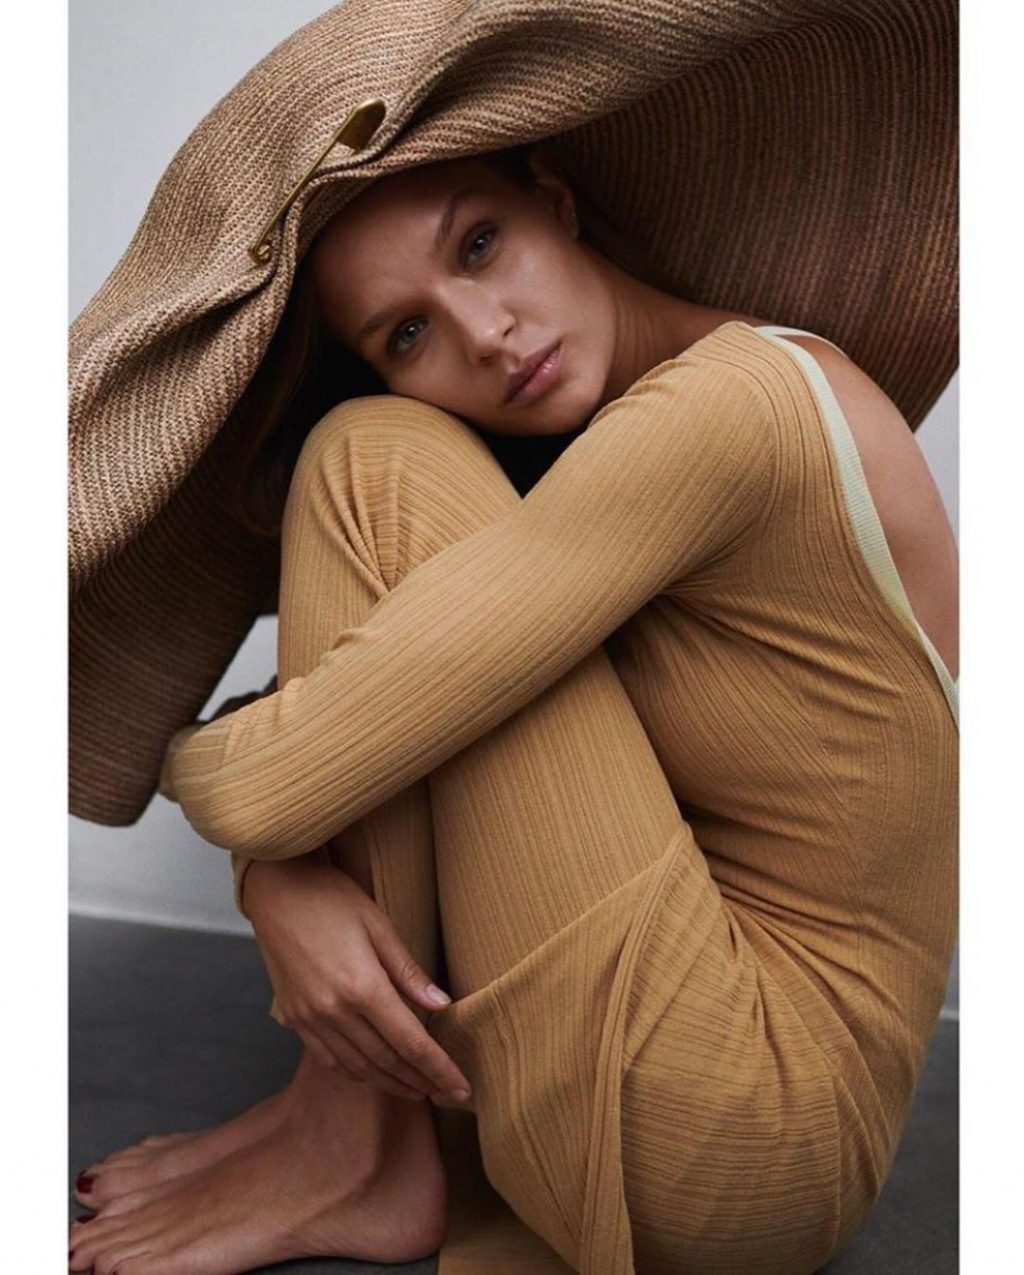 Josephine Skriver Sexy & Topless – Eurowoman (18 Photos)